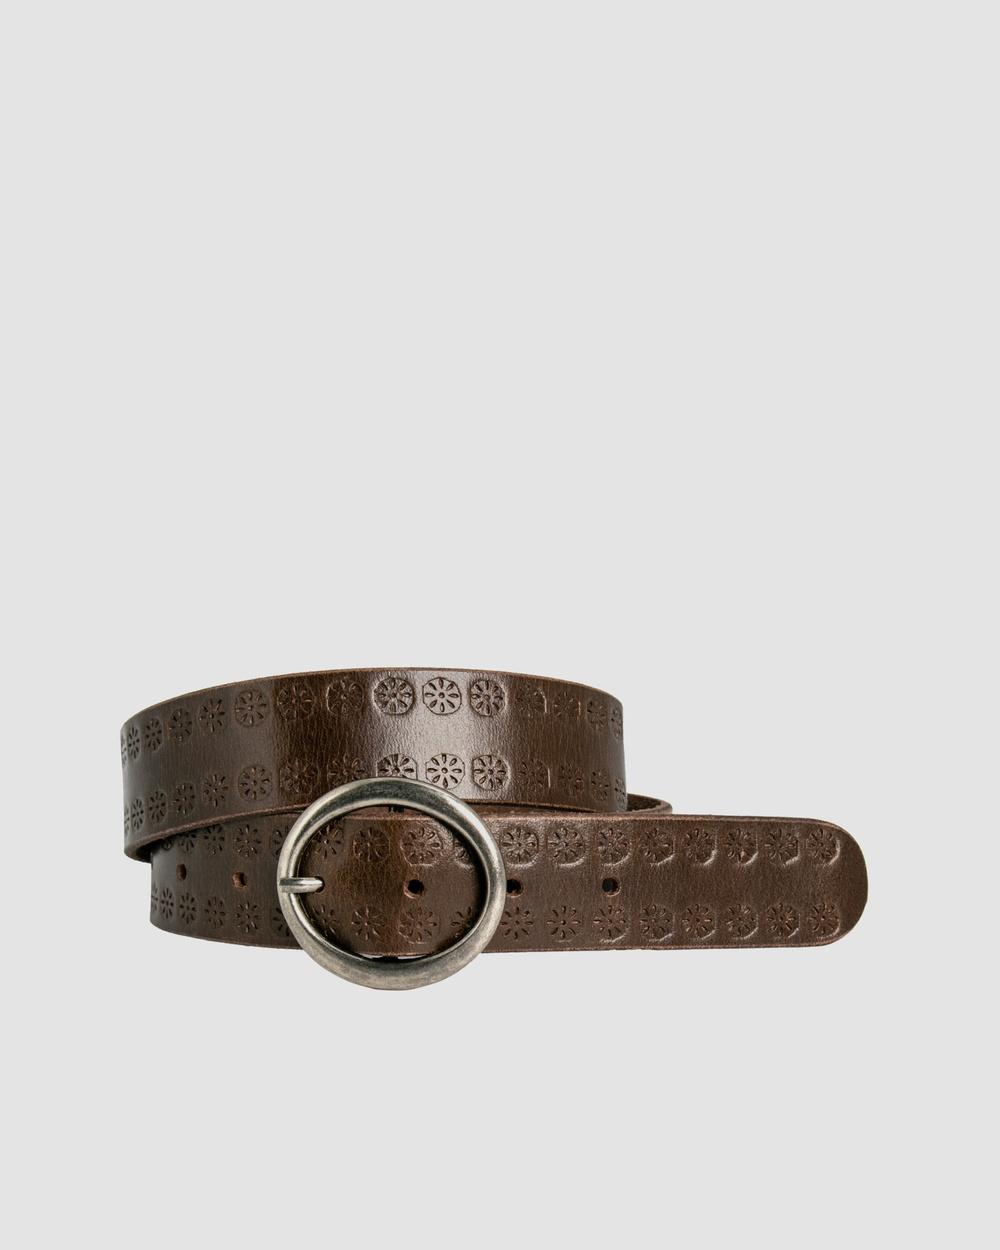 Loop Leather Co Flower Drum Belts Chocolate